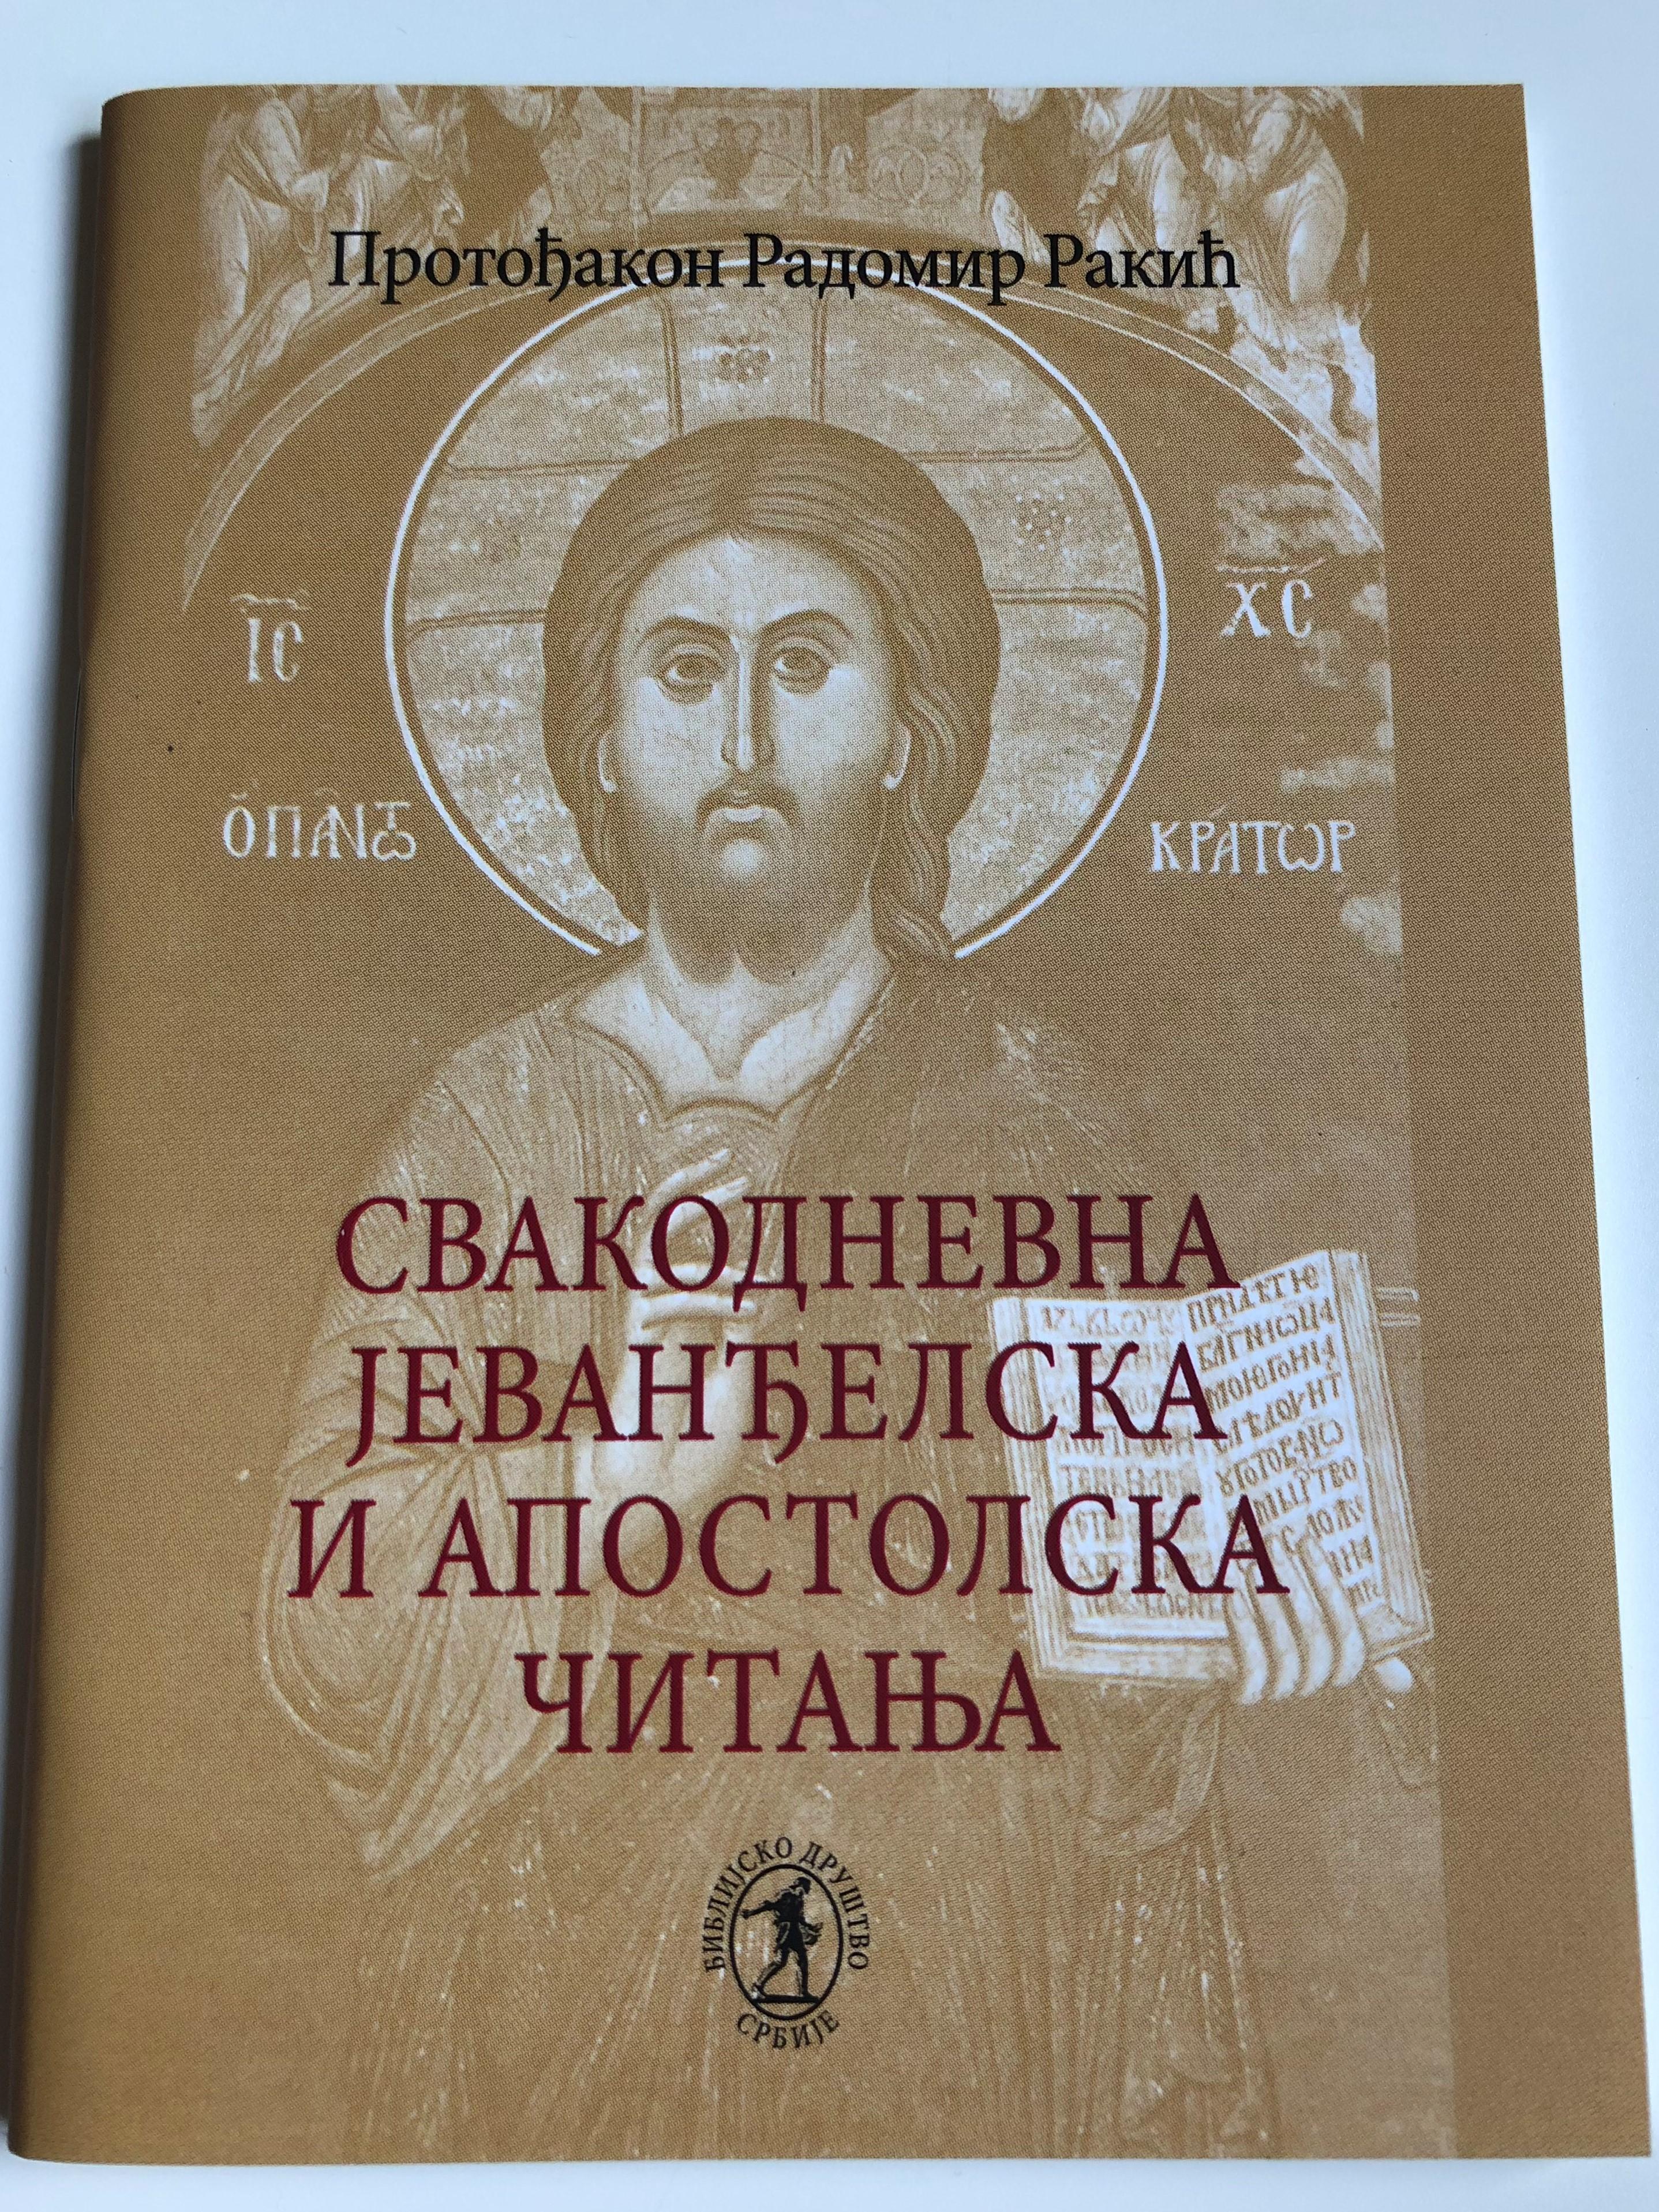 svakodnevna-jevan-elska-i-apostolska-itanja-by-proto-akon-radomir-raki-1.jpg